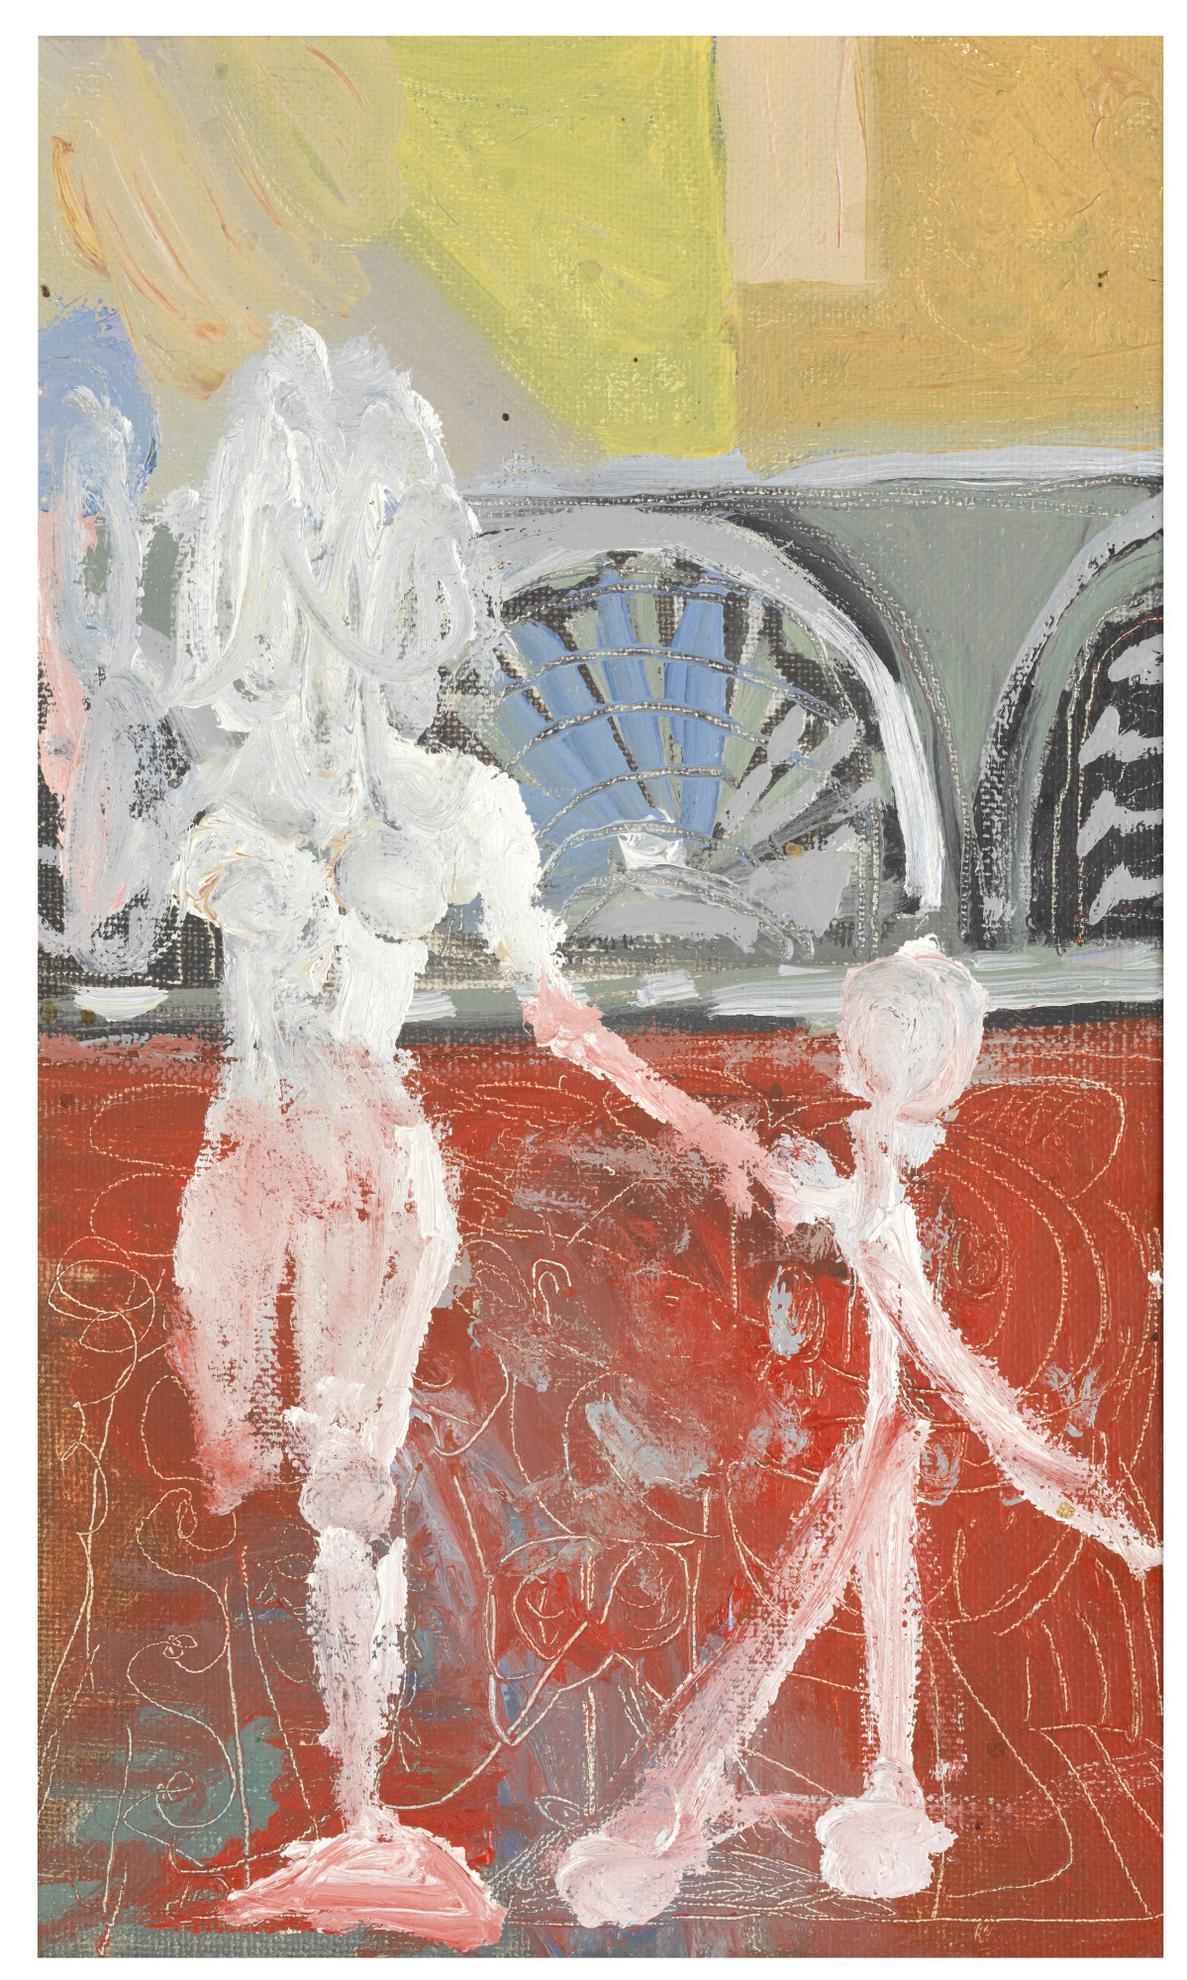 George Condo-Untitled-1994